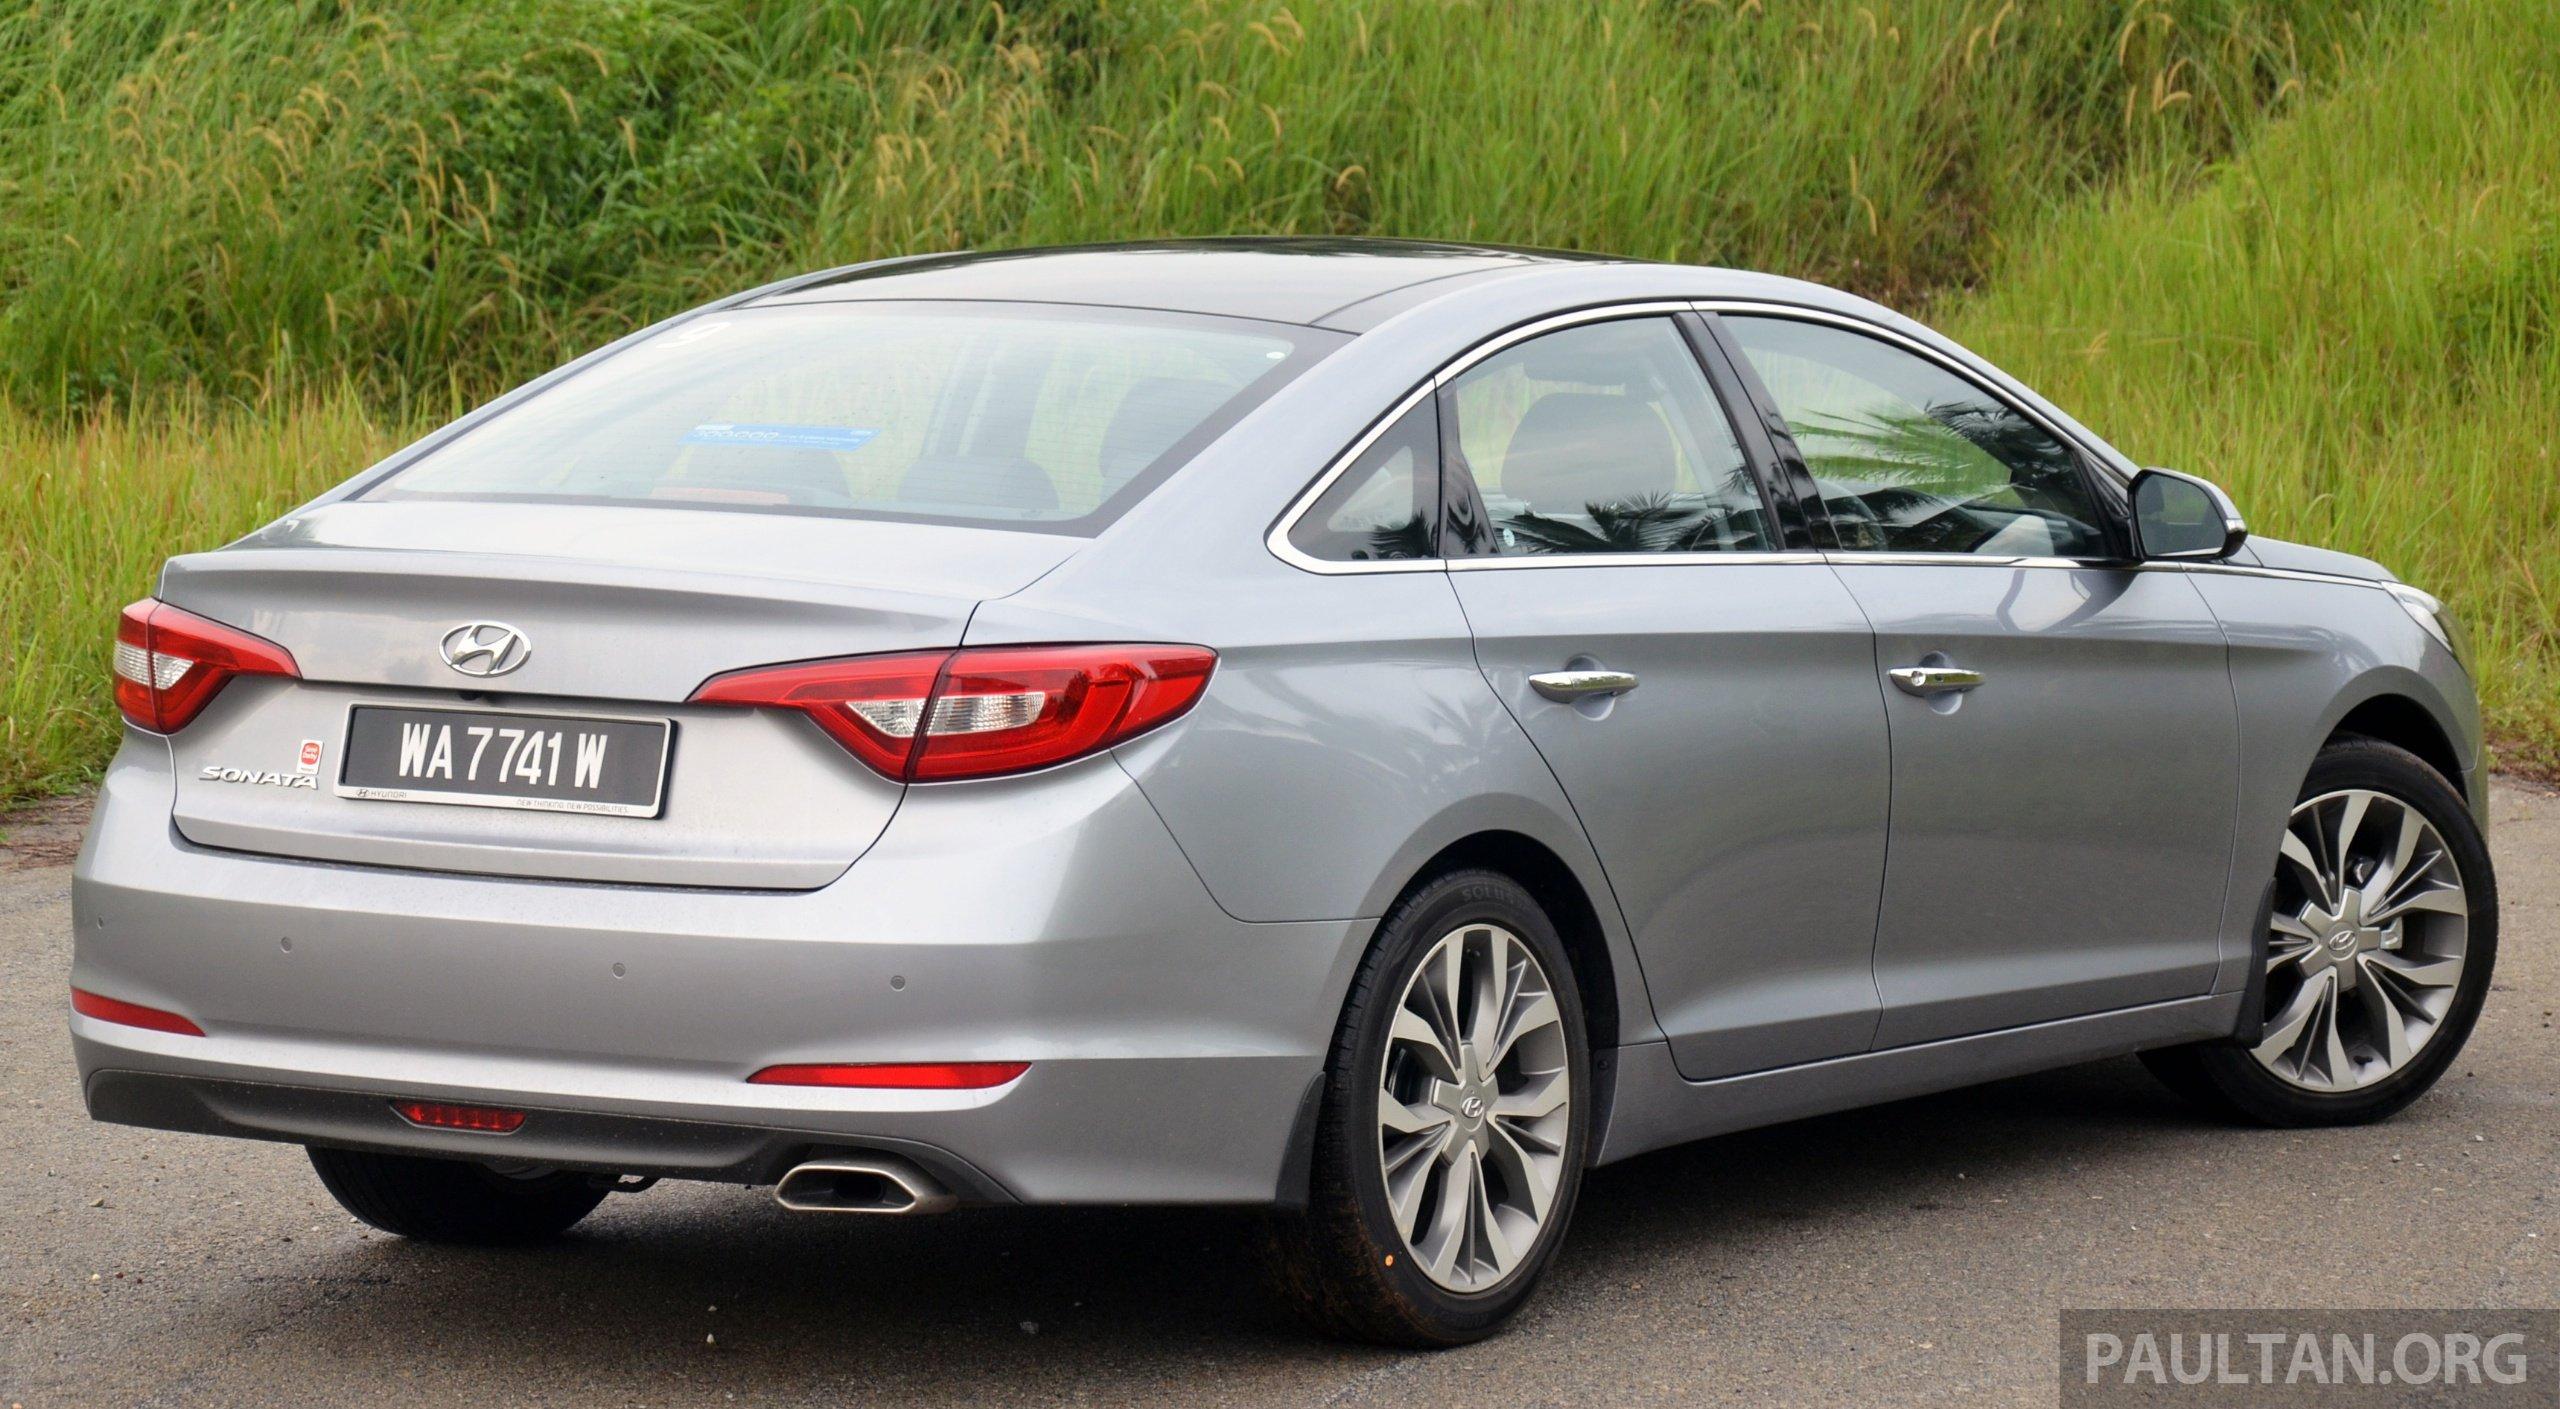 Driven Hyundai Sonata Lf 2 0 Executive Tested Image 301414